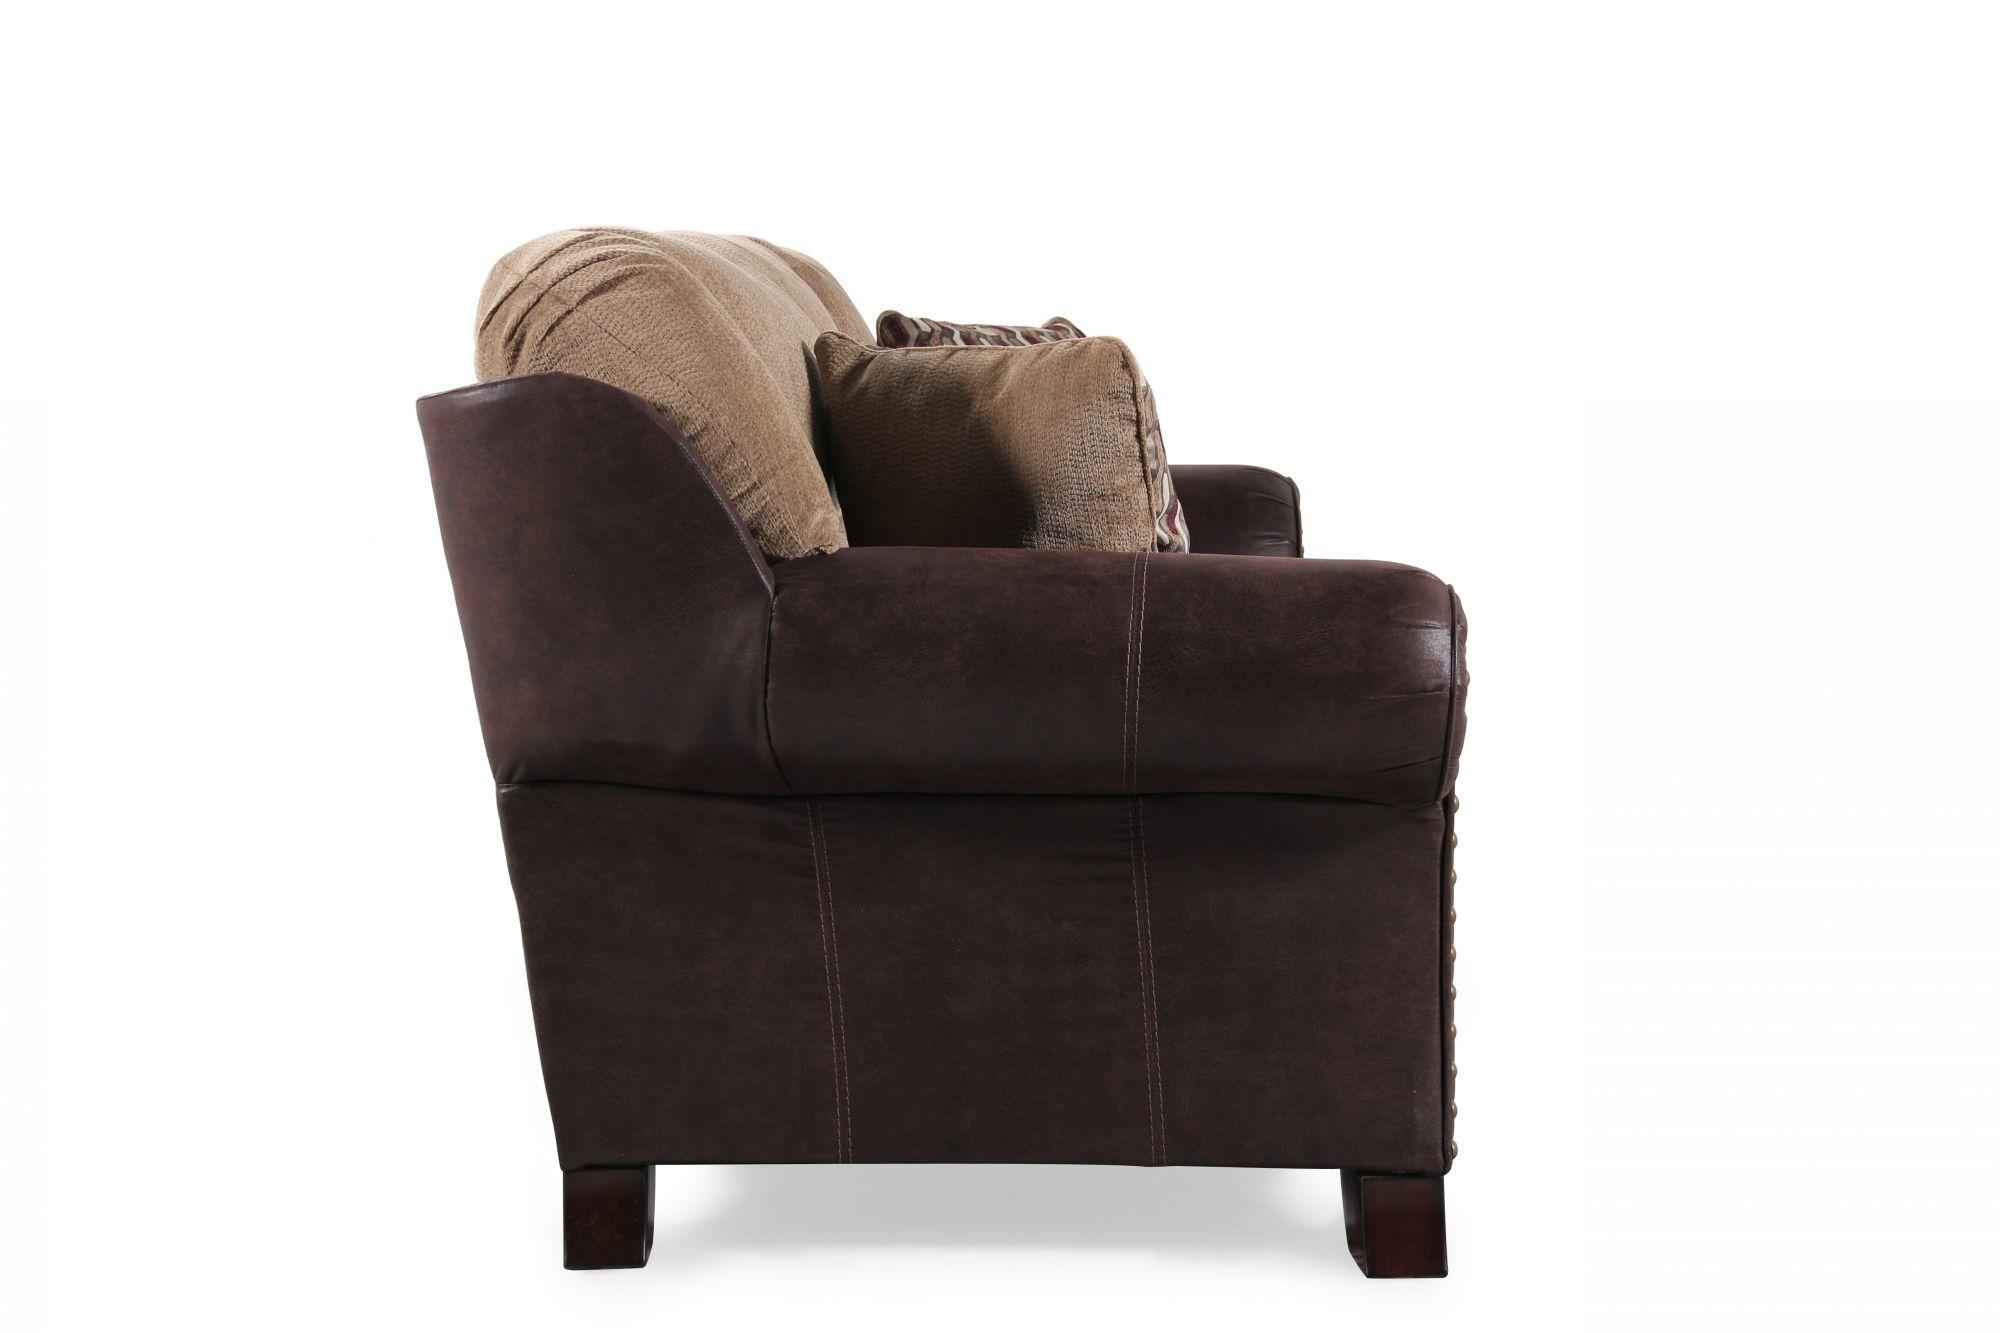 ashley furniture morandi mocha sofa leather recliner set vandive mathis brothers